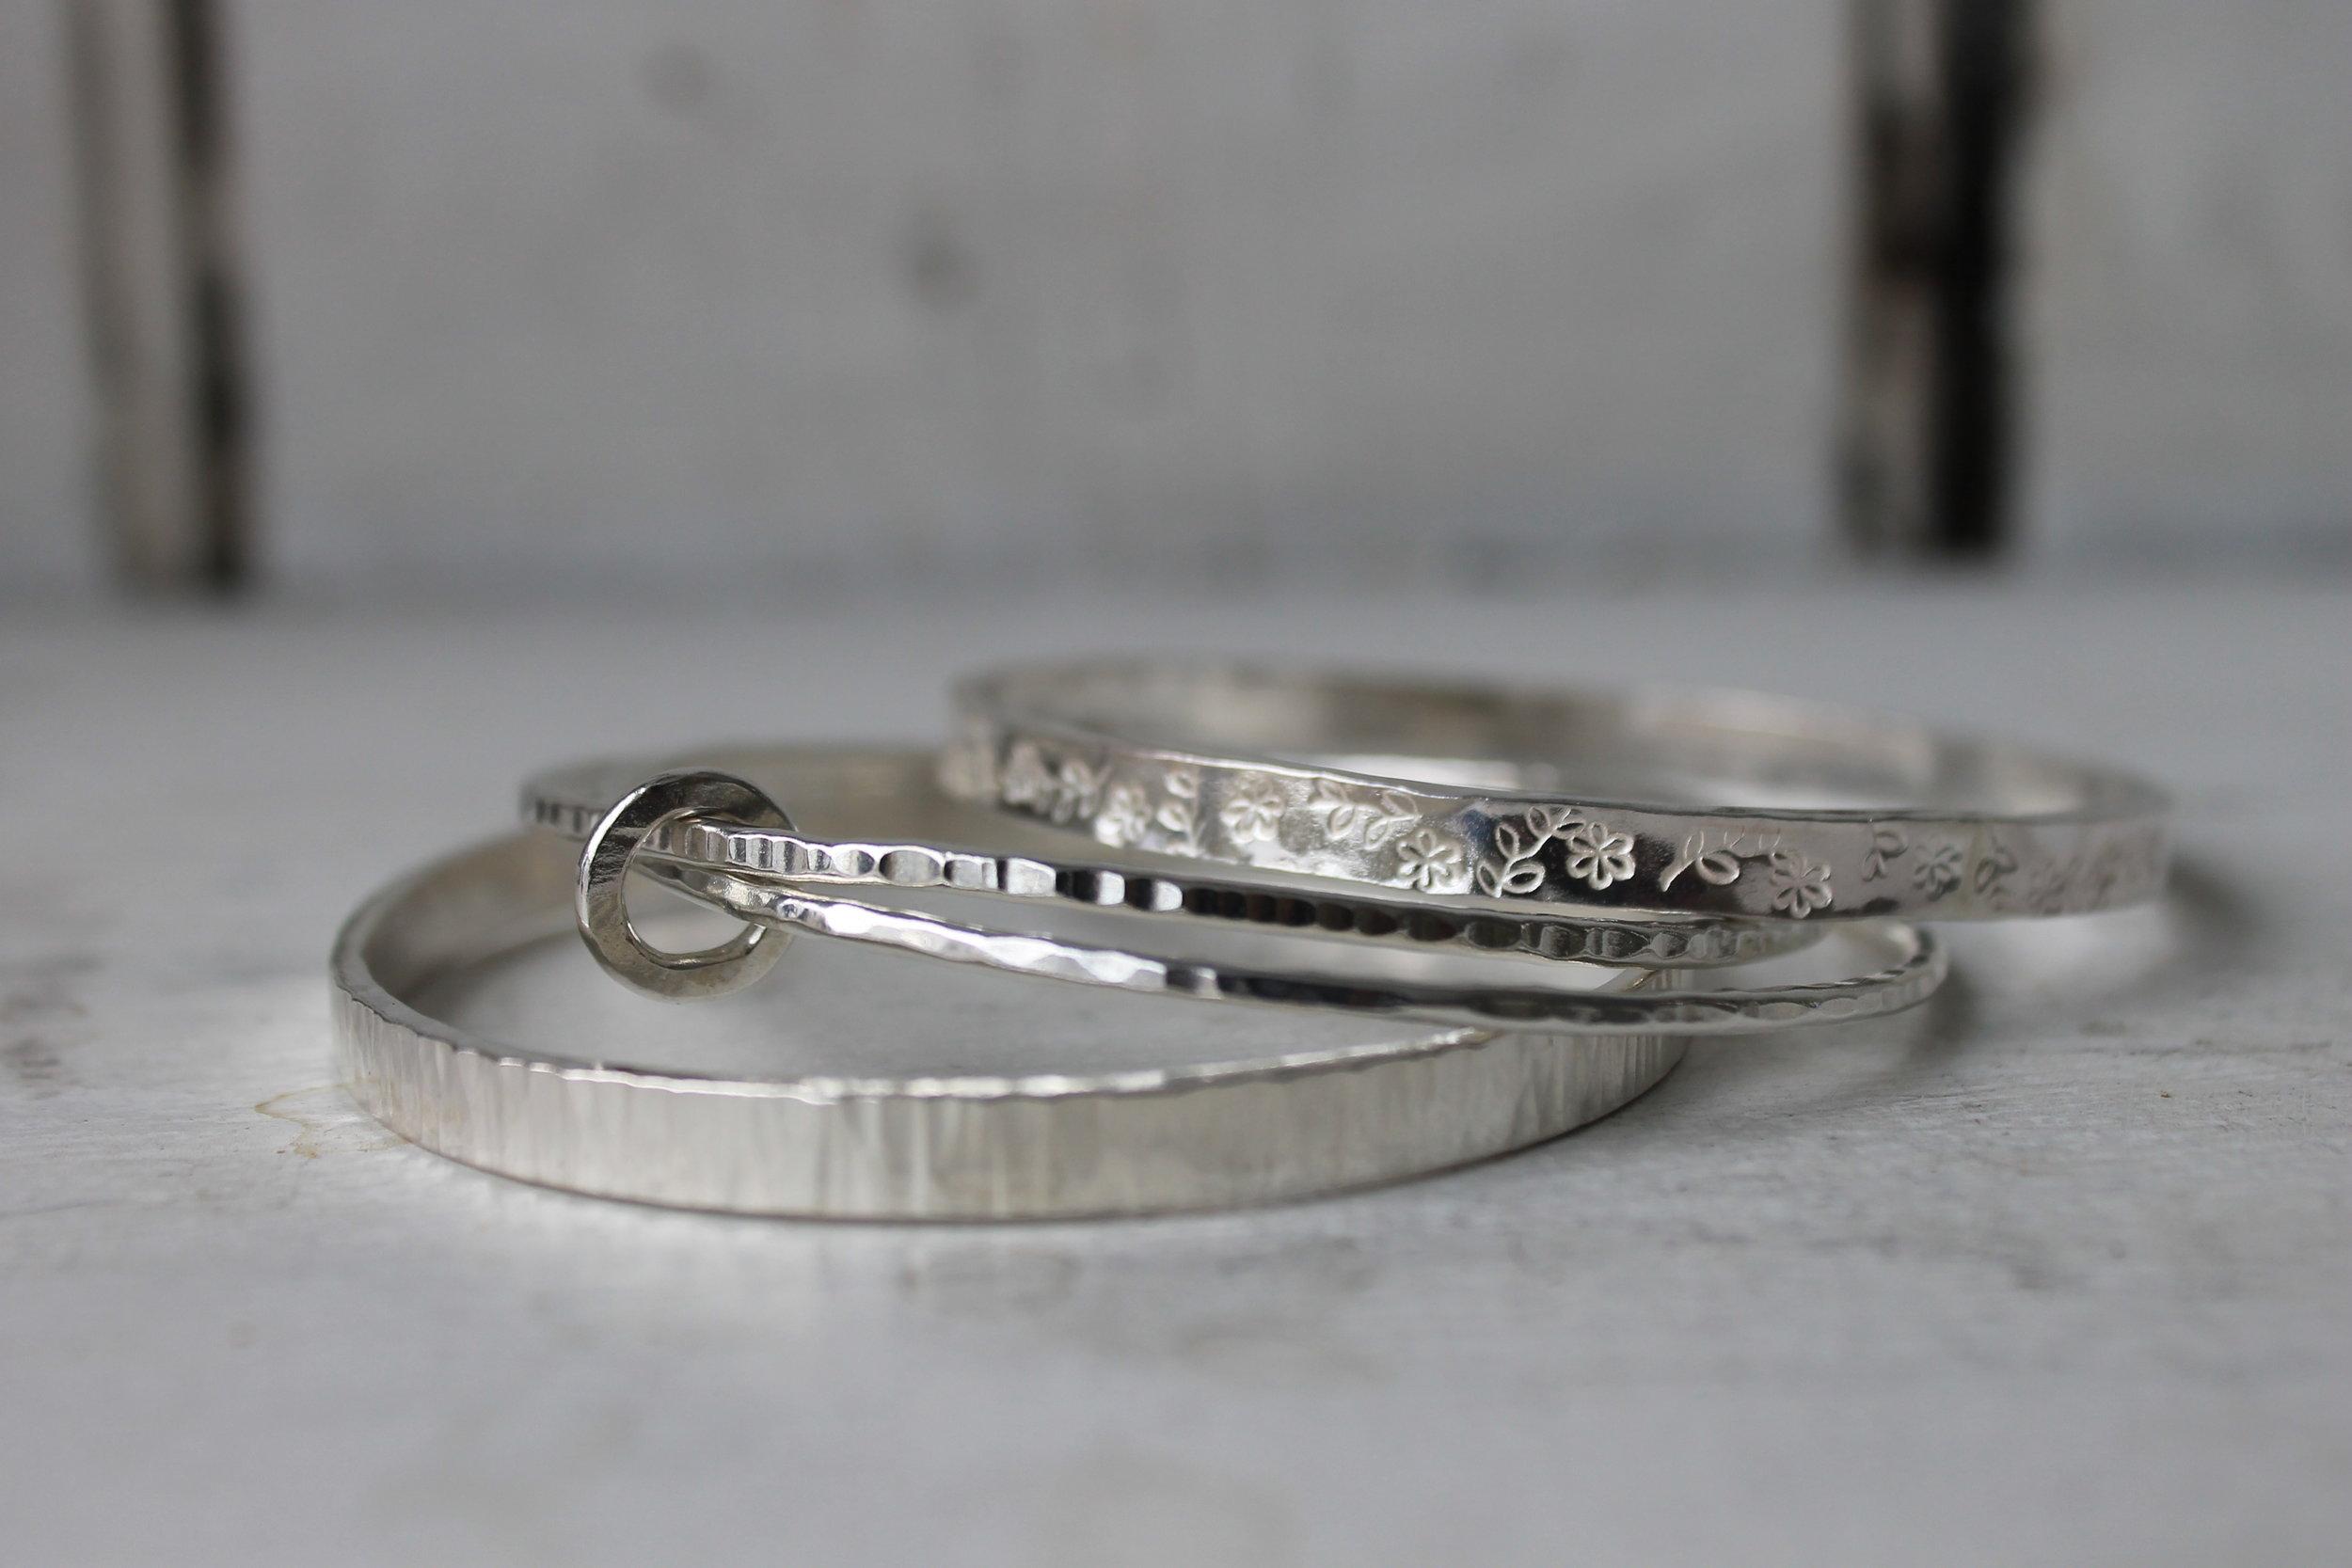 Jewellery_class_birmingham 3.jpg